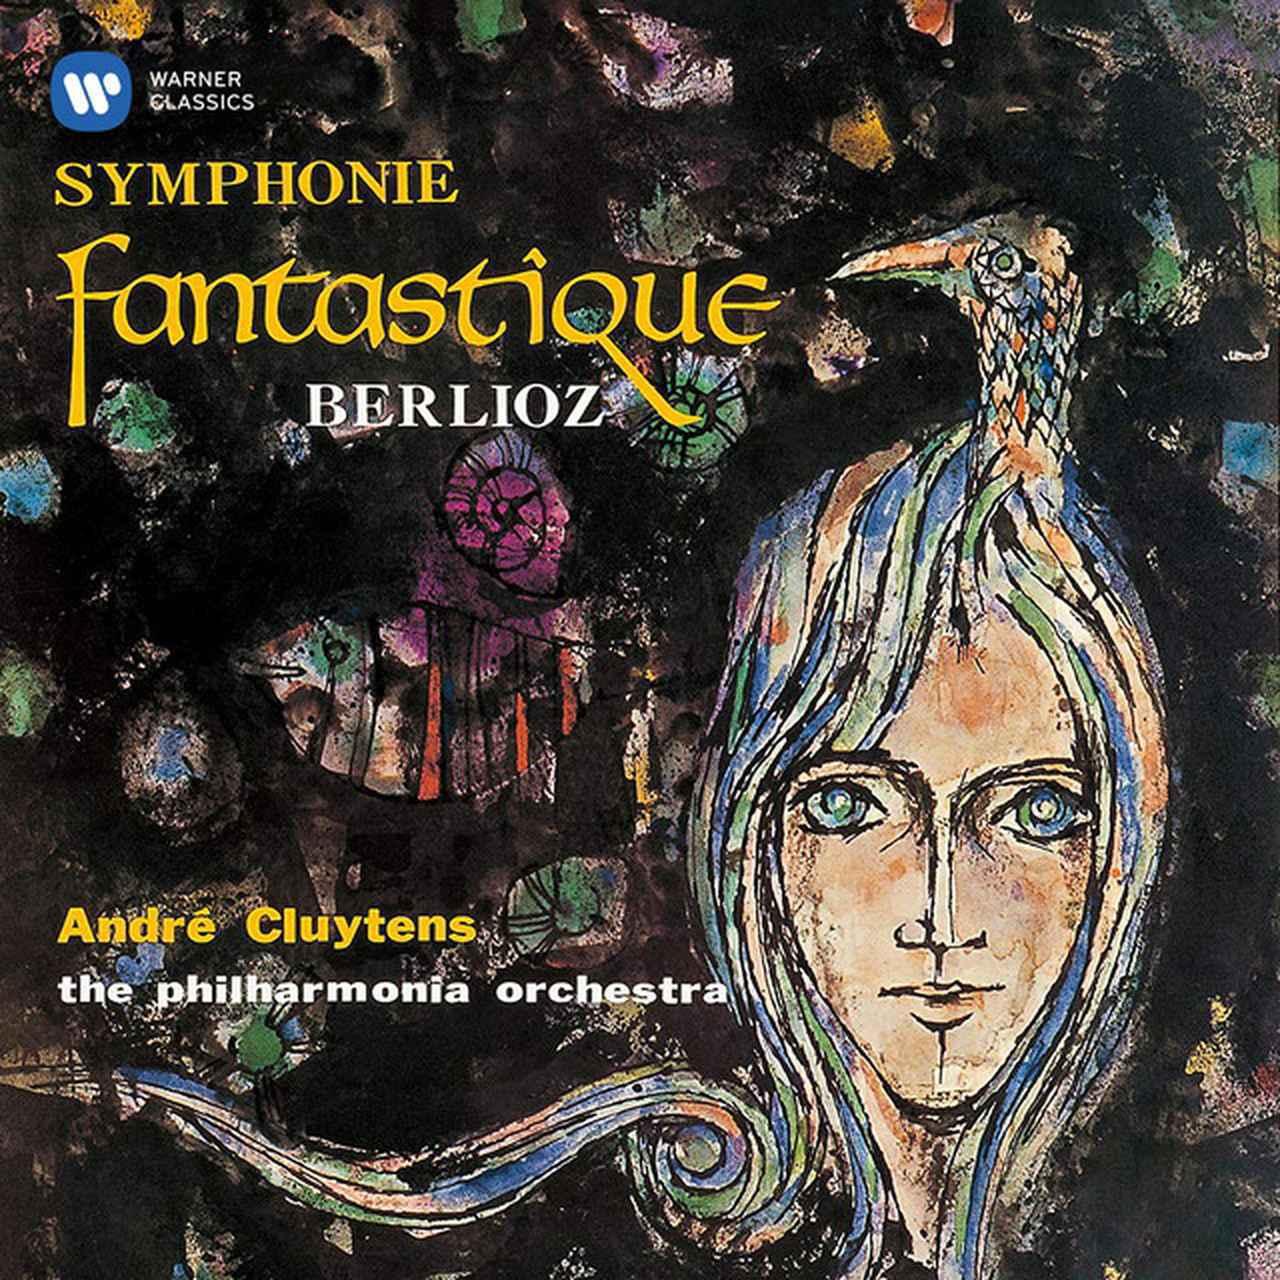 画像: Berlioz: Symphonie fantastique, Op. 14/André Cluytens